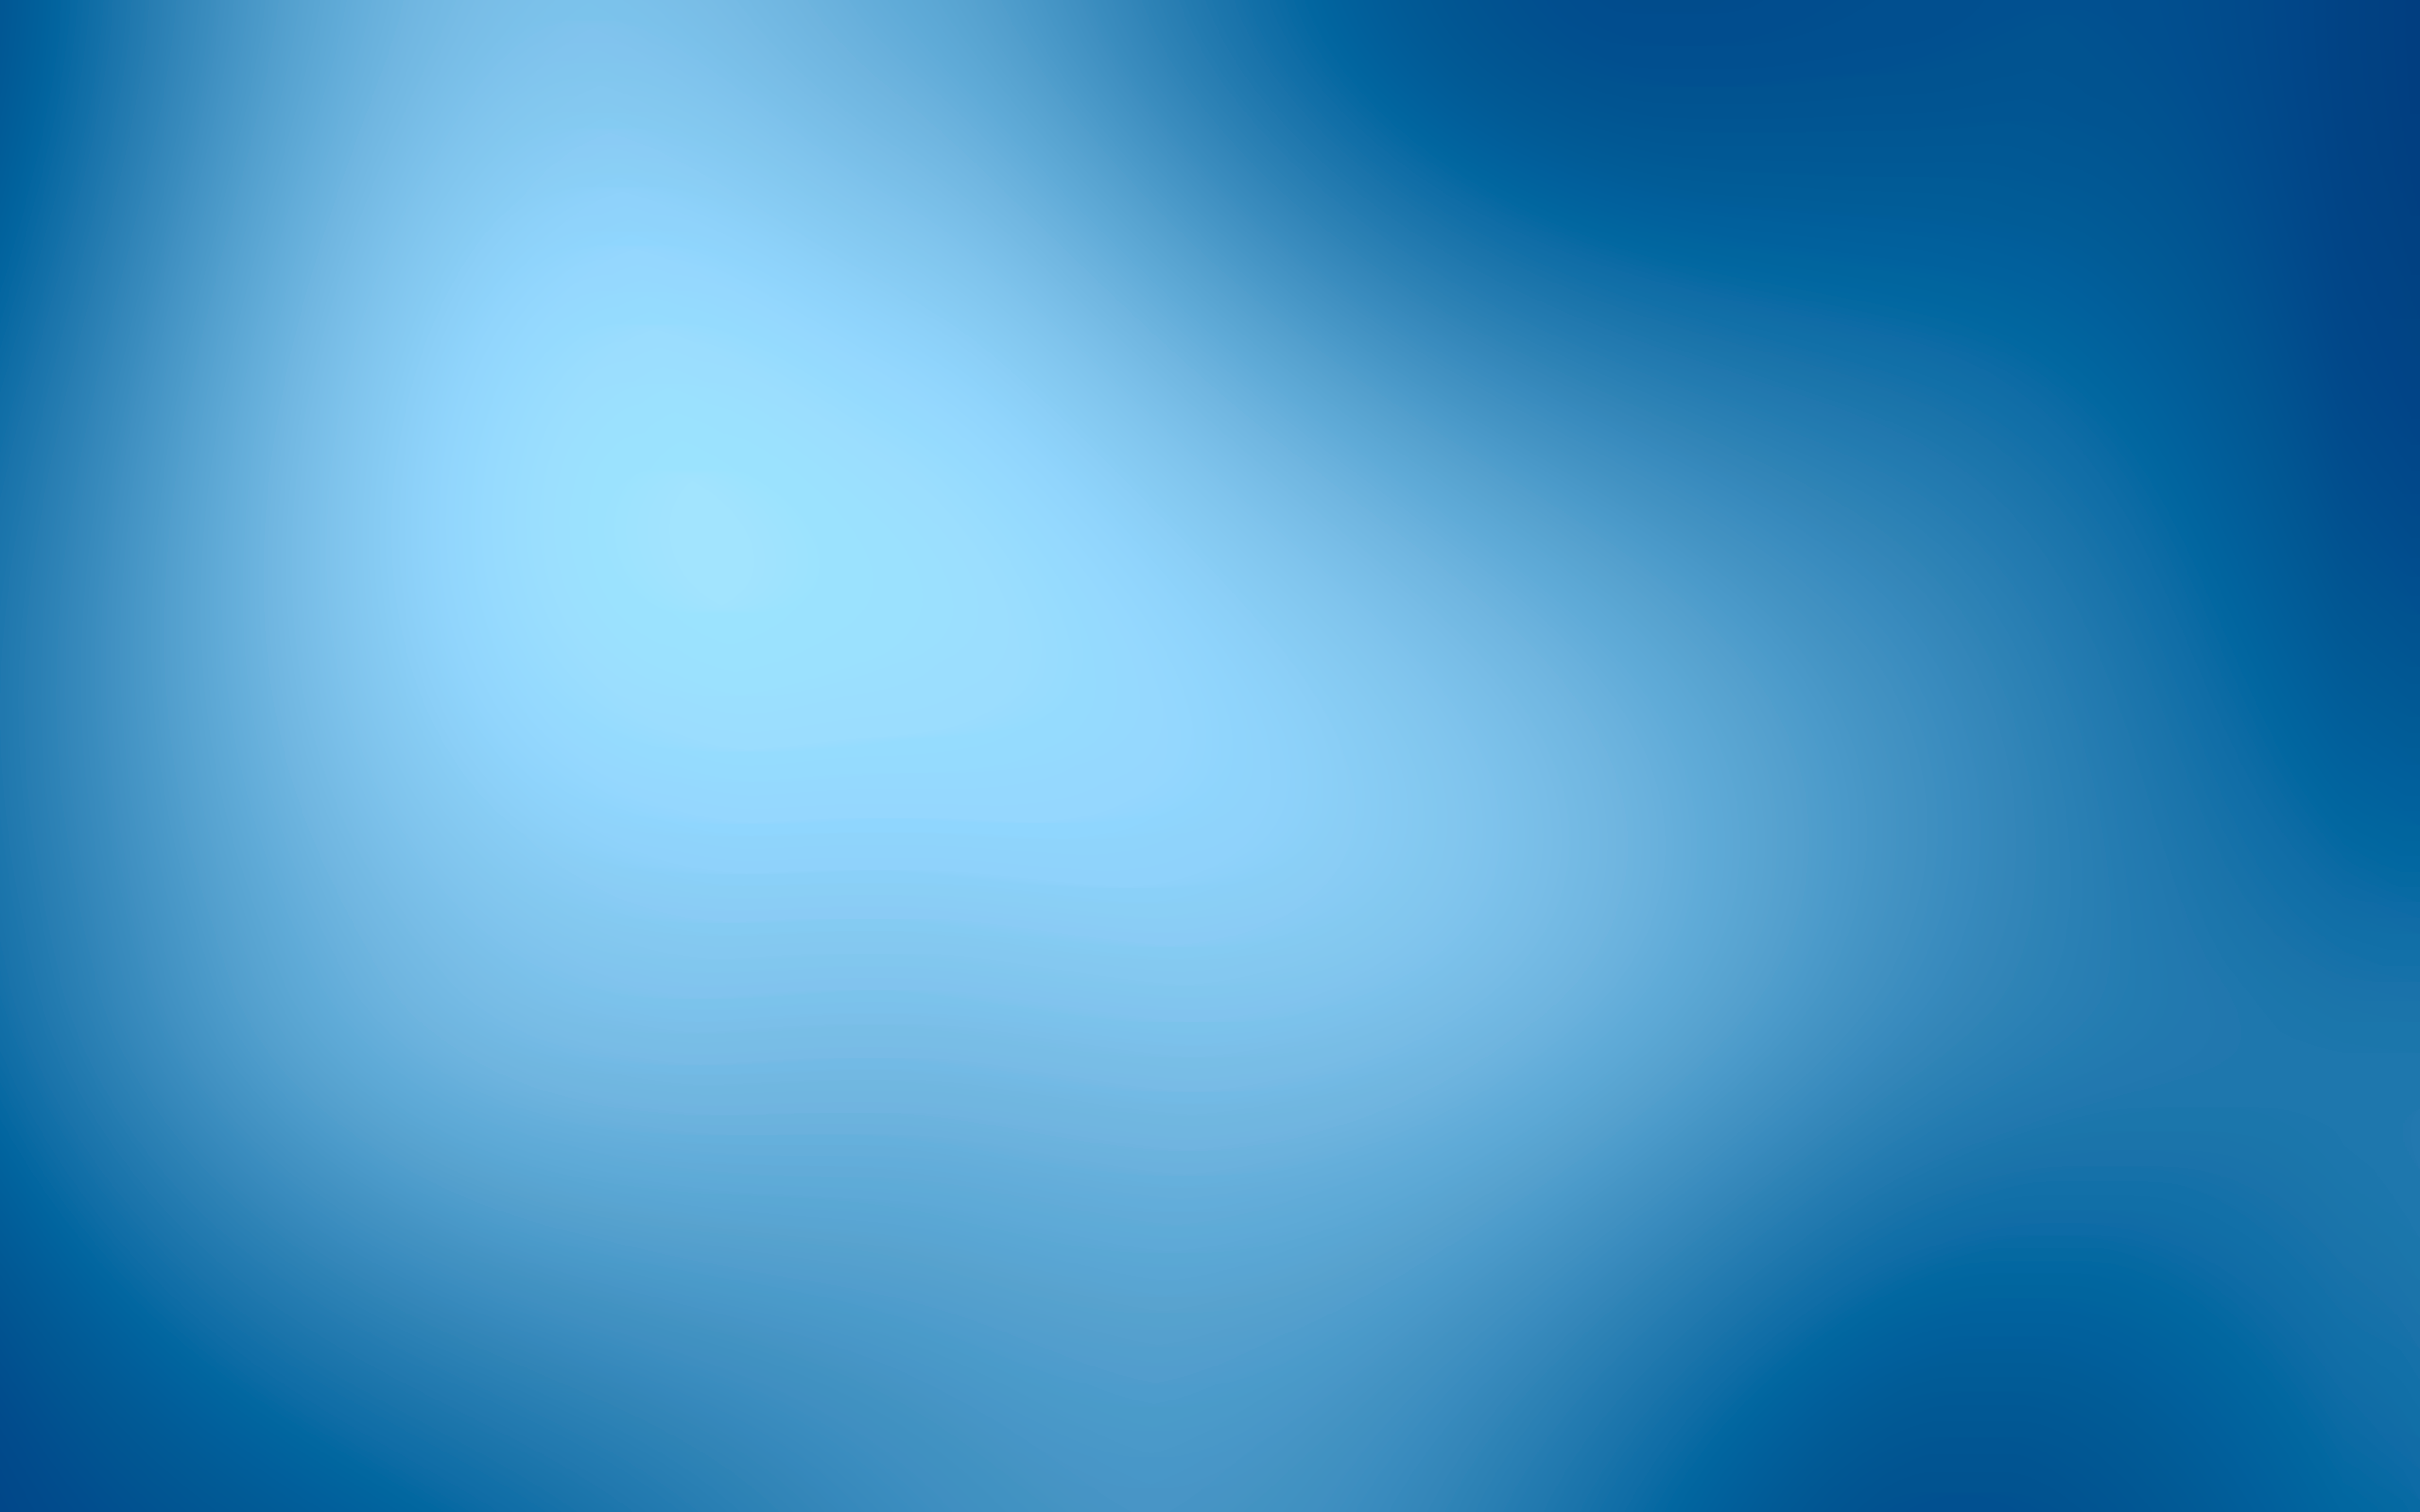 Azul Full HD Papel De Parede And Planos De Fundo